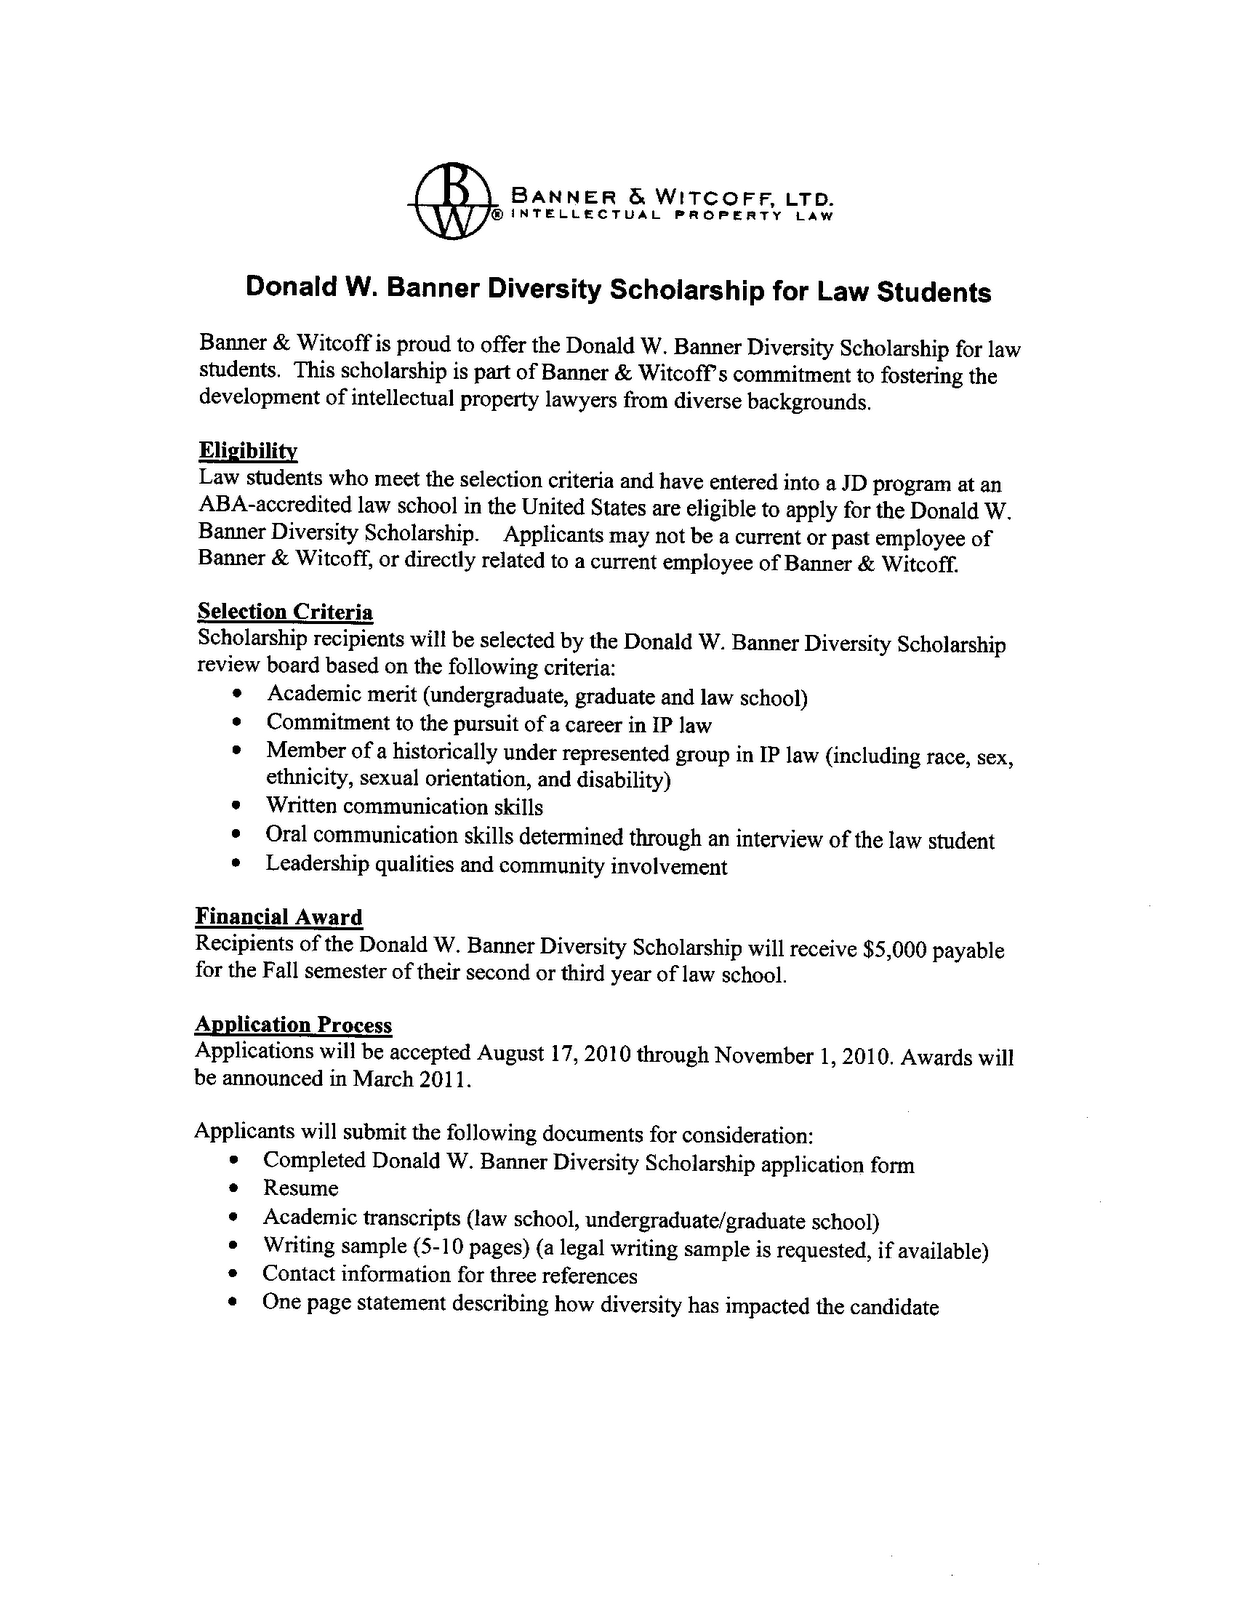 010 Harvard Accepted Essays Essay Fantastic Business School Reddit College Book Full